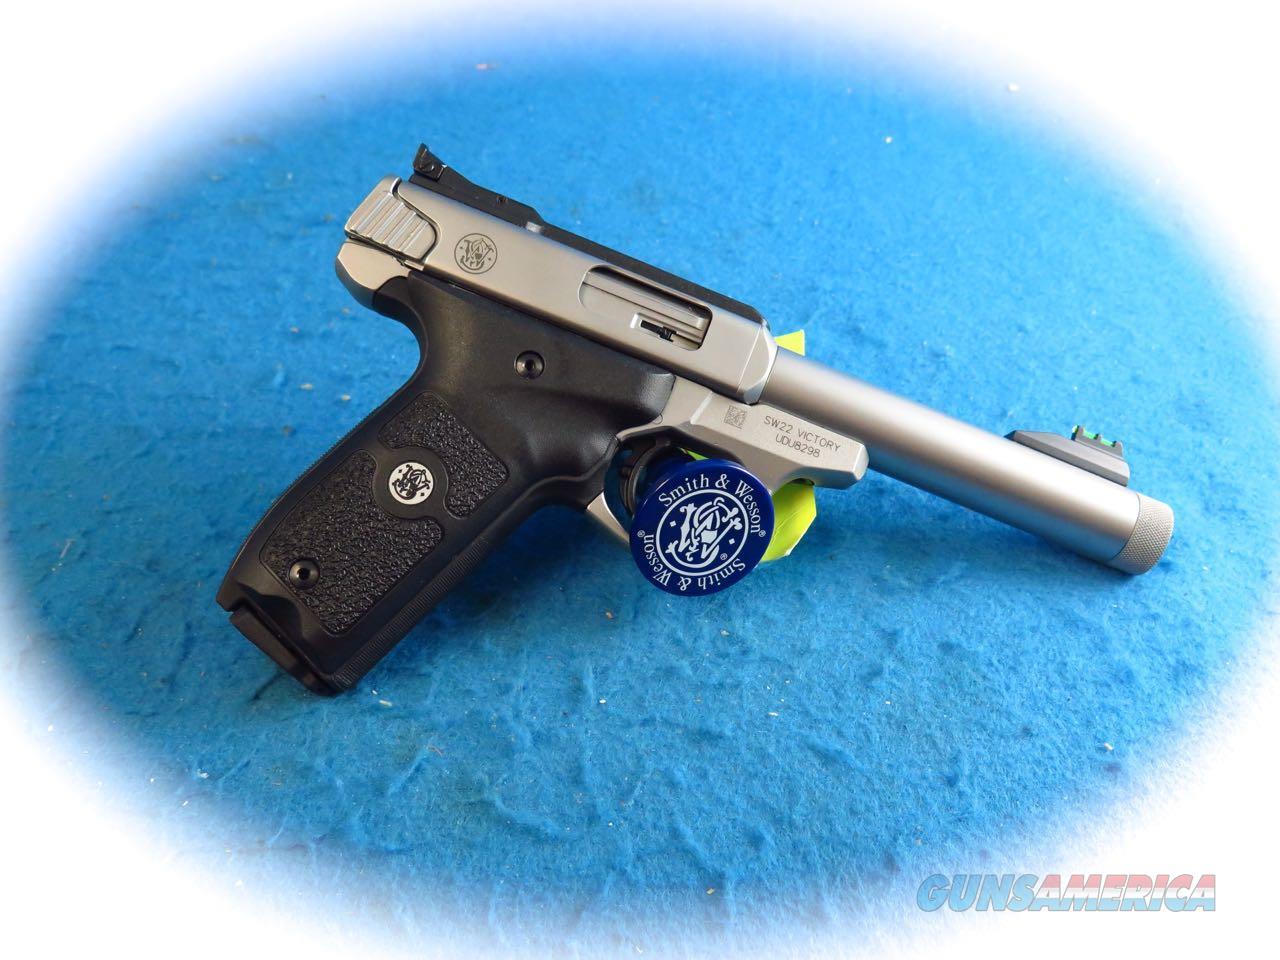 Smith & Wesson Model SW22 Victory .22LR Semi Auto Pistol  W/TB SKU 10201 **New**  Guns > Pistols > Smith & Wesson Pistols - Autos > .22 Autos